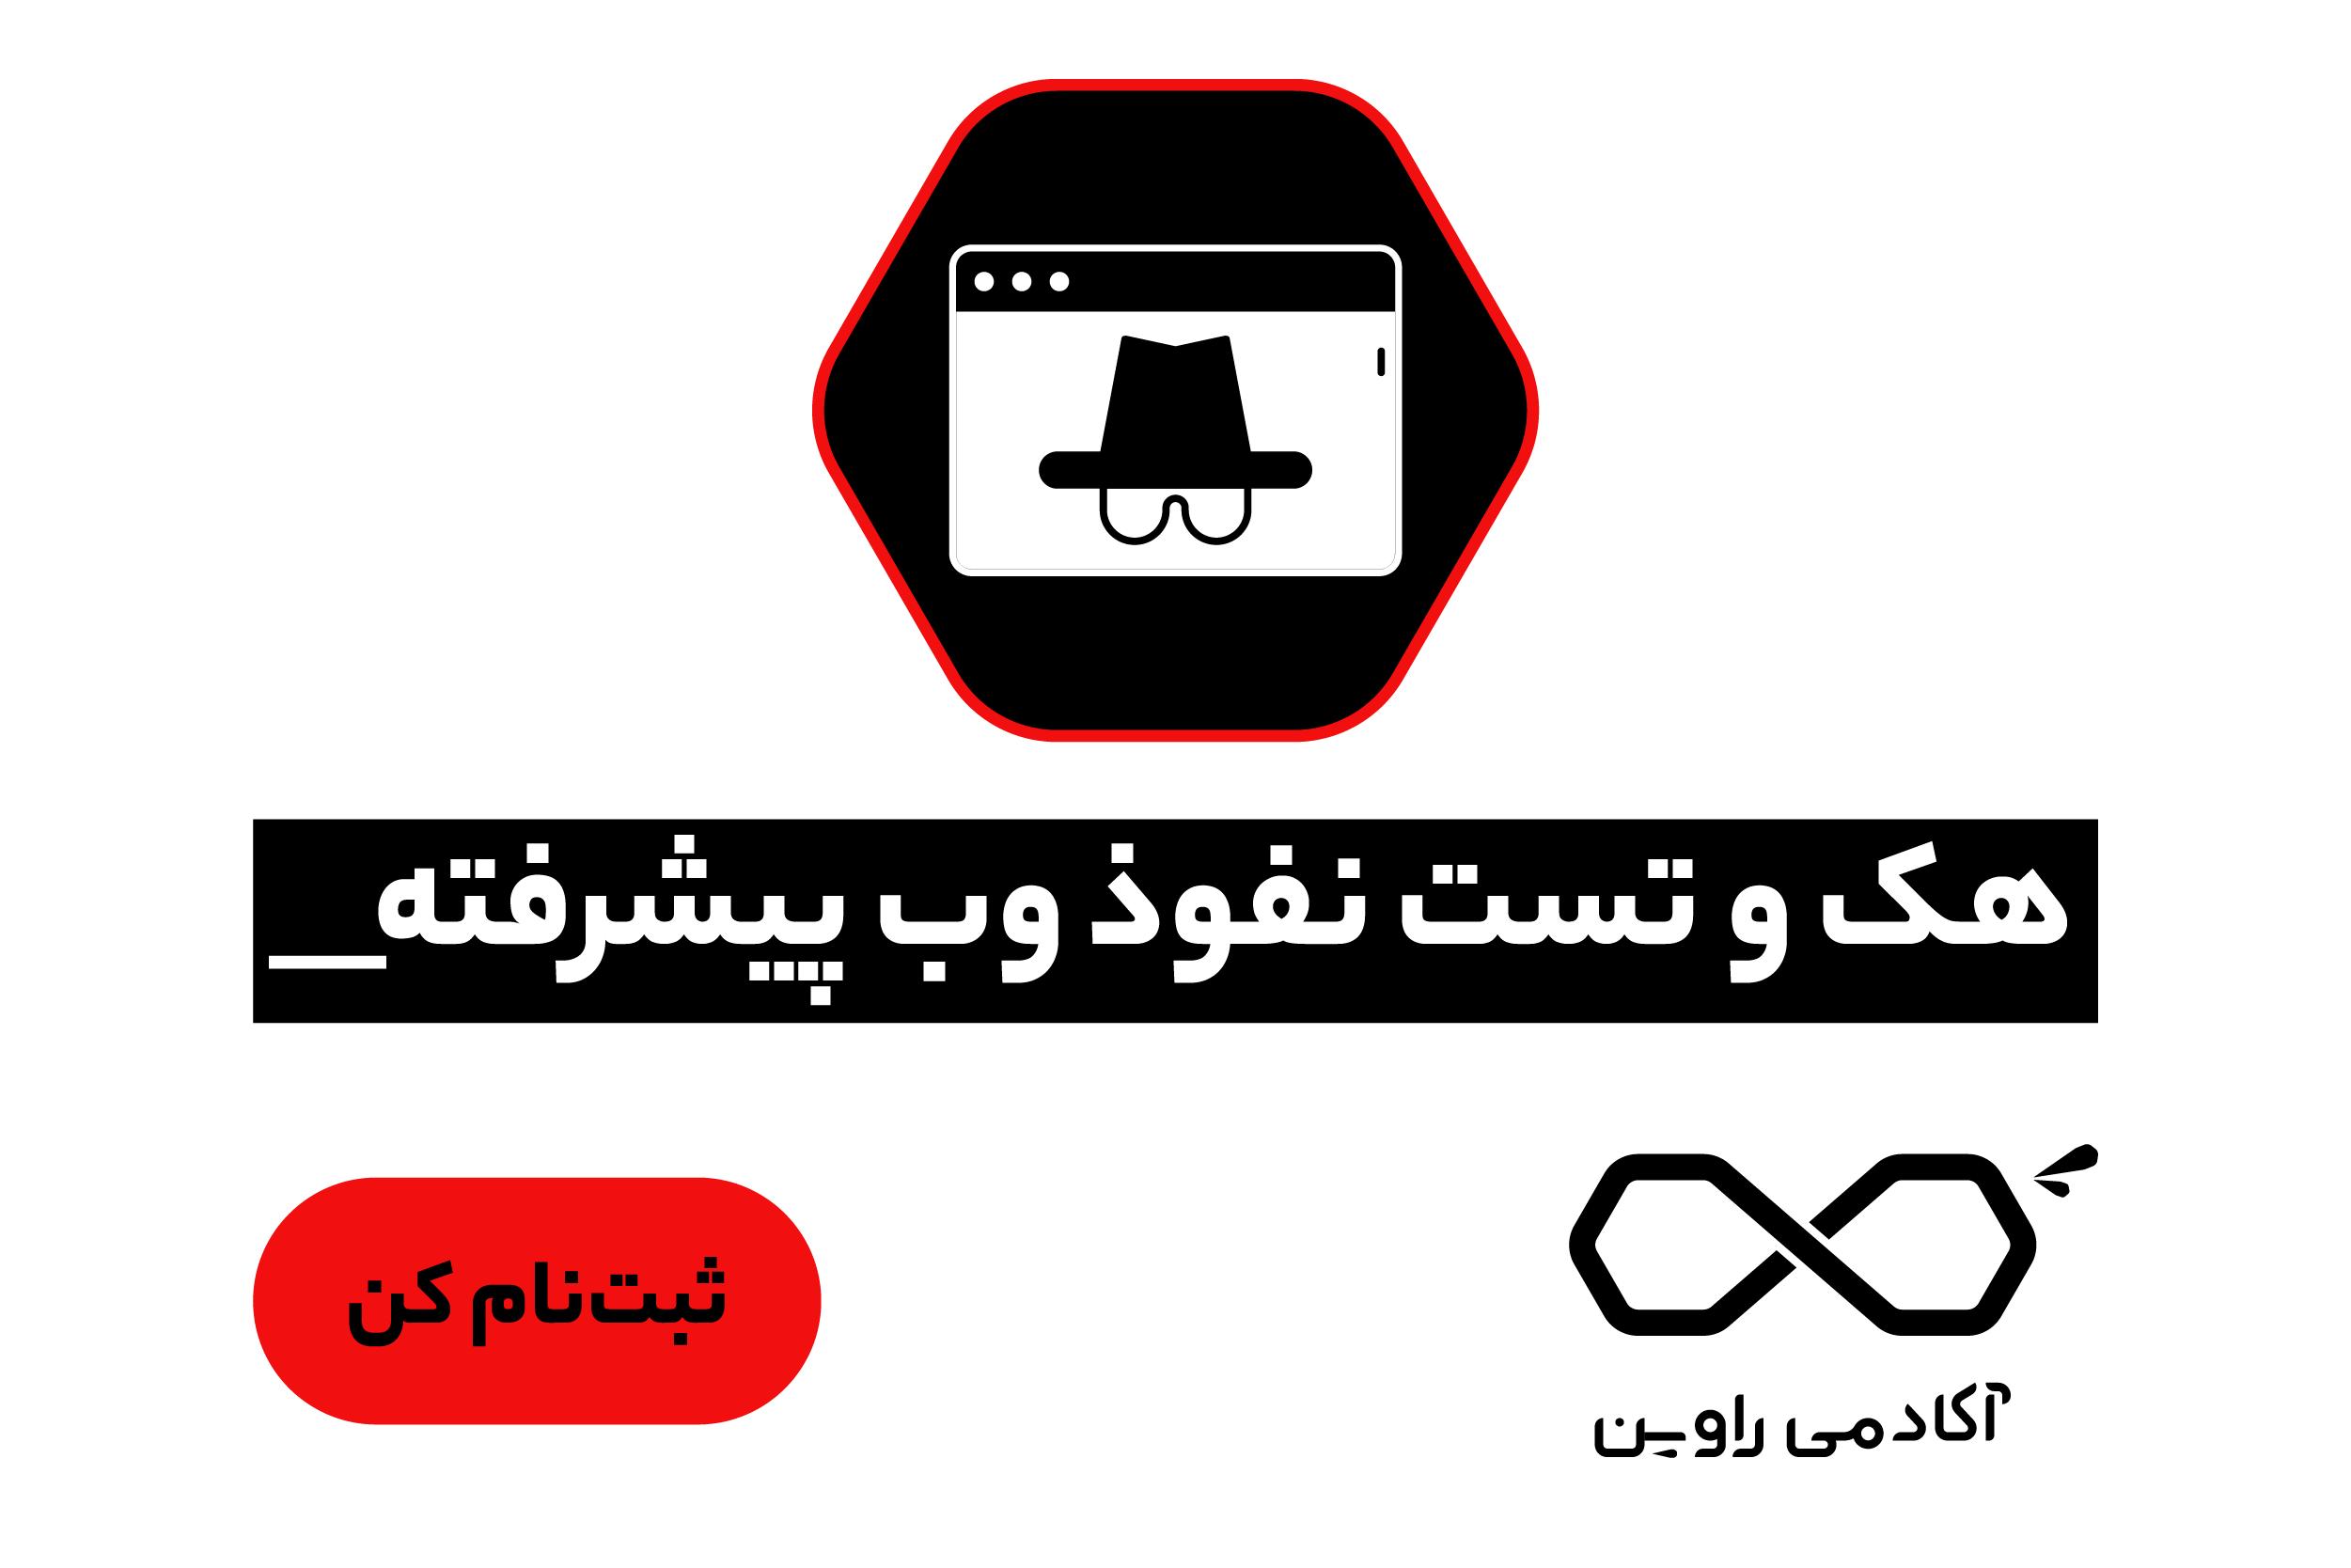 Web Hacking Pro RavinAcademy